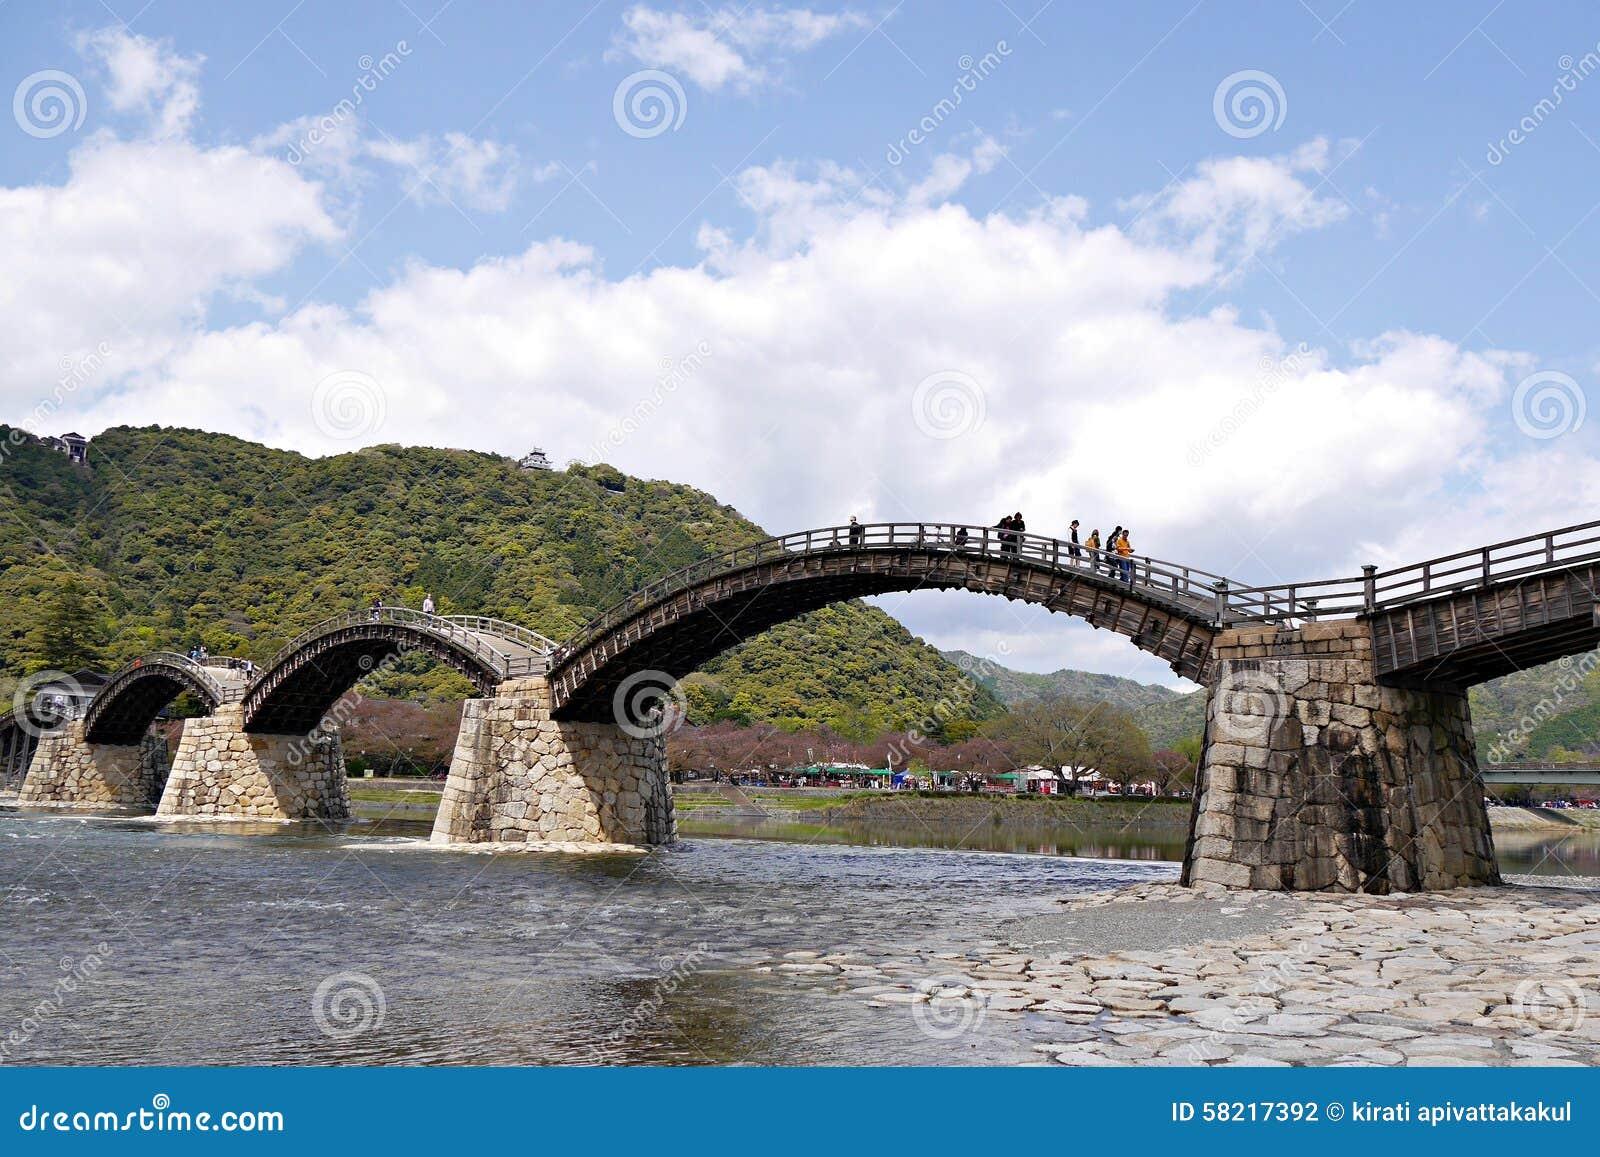 Kintai Bridge in Iwakuni, Yamaguchi Prefecture, Japan